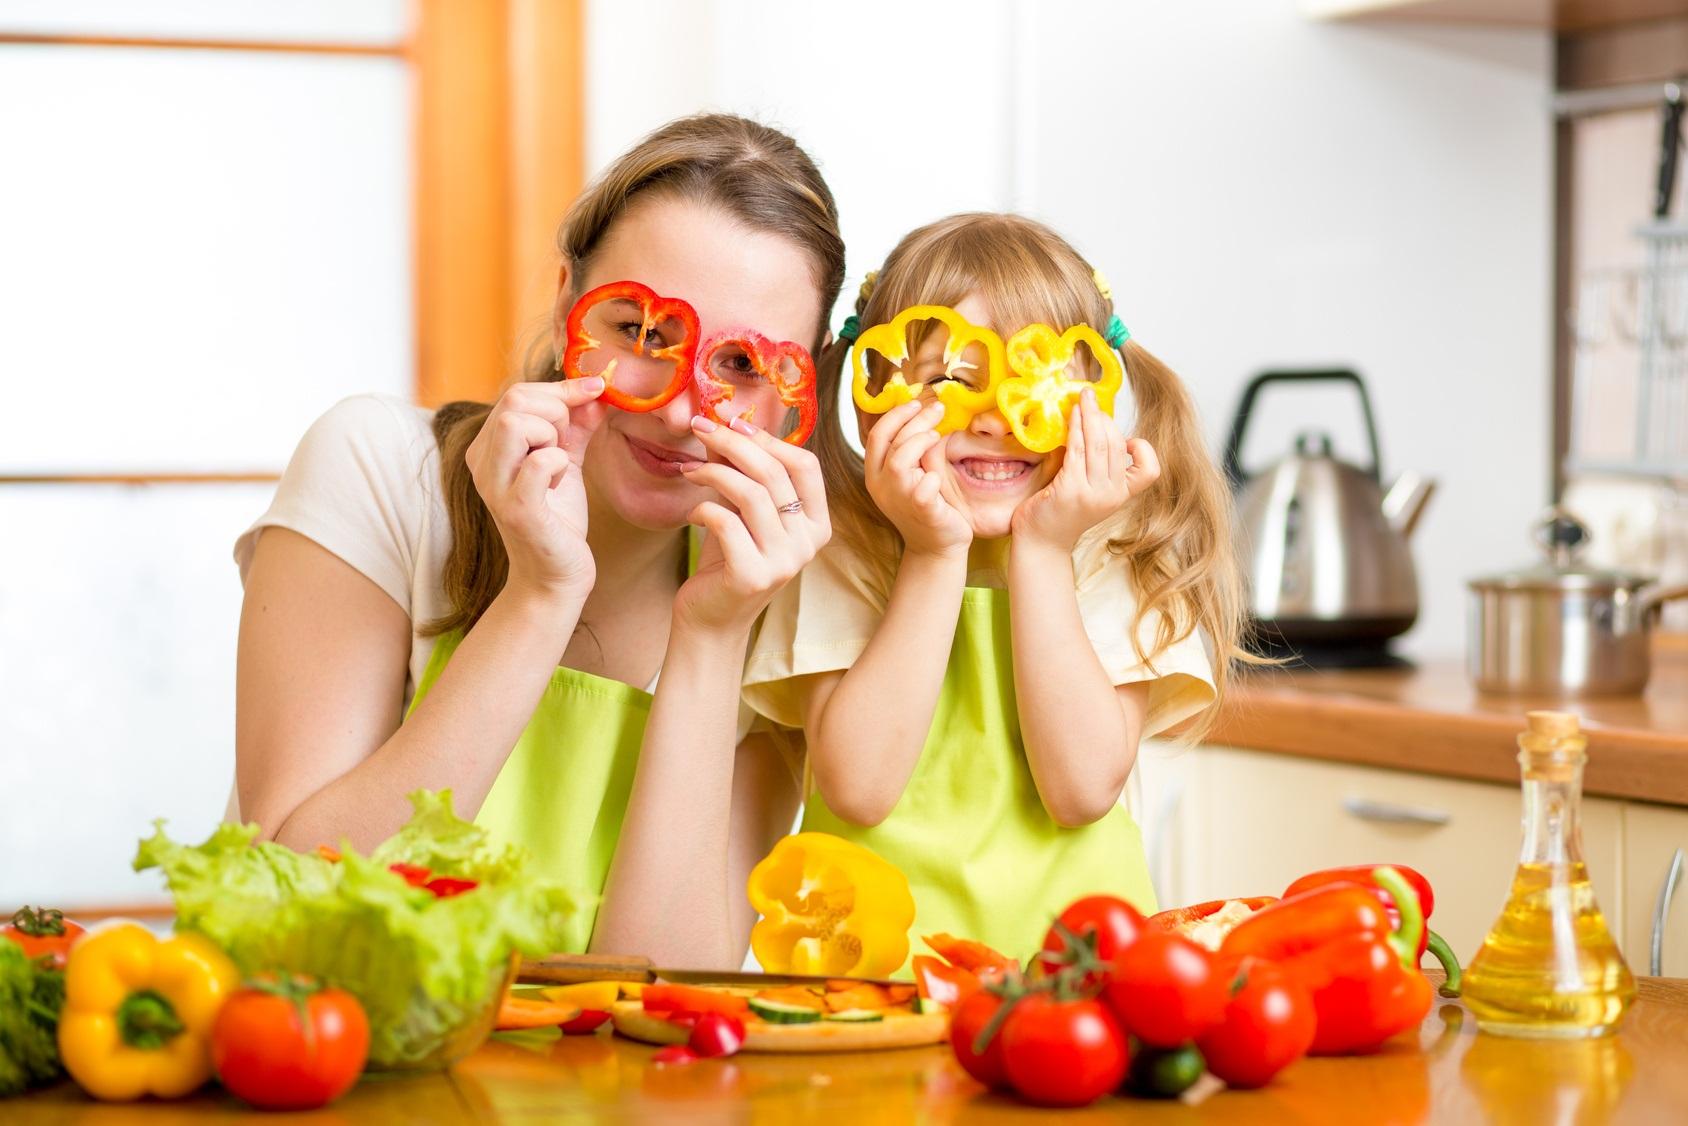 bambini mangiare bene